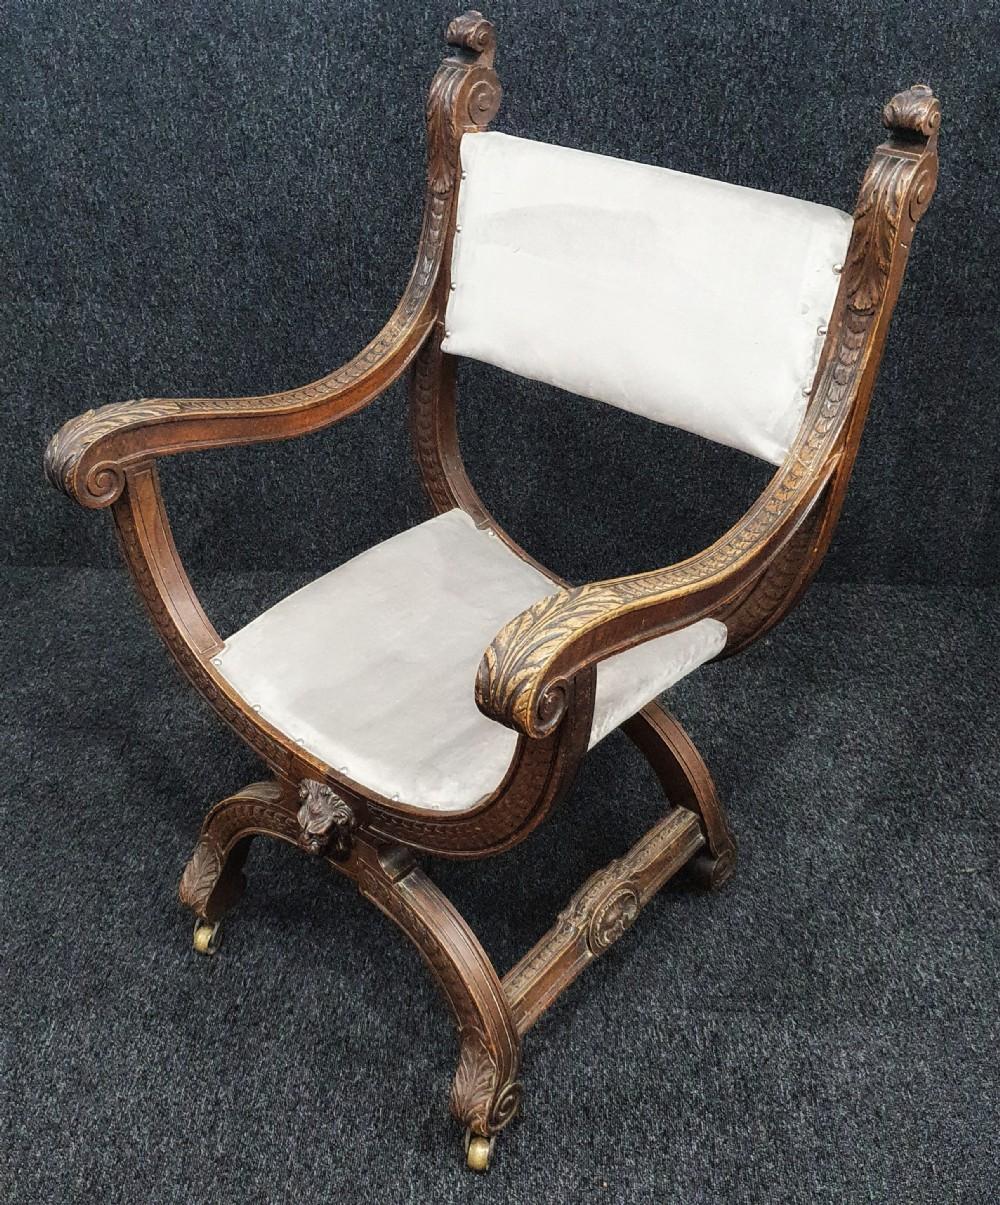 victorian carved oak x framed armchair on casters reupholstered in ice blue grey velvet